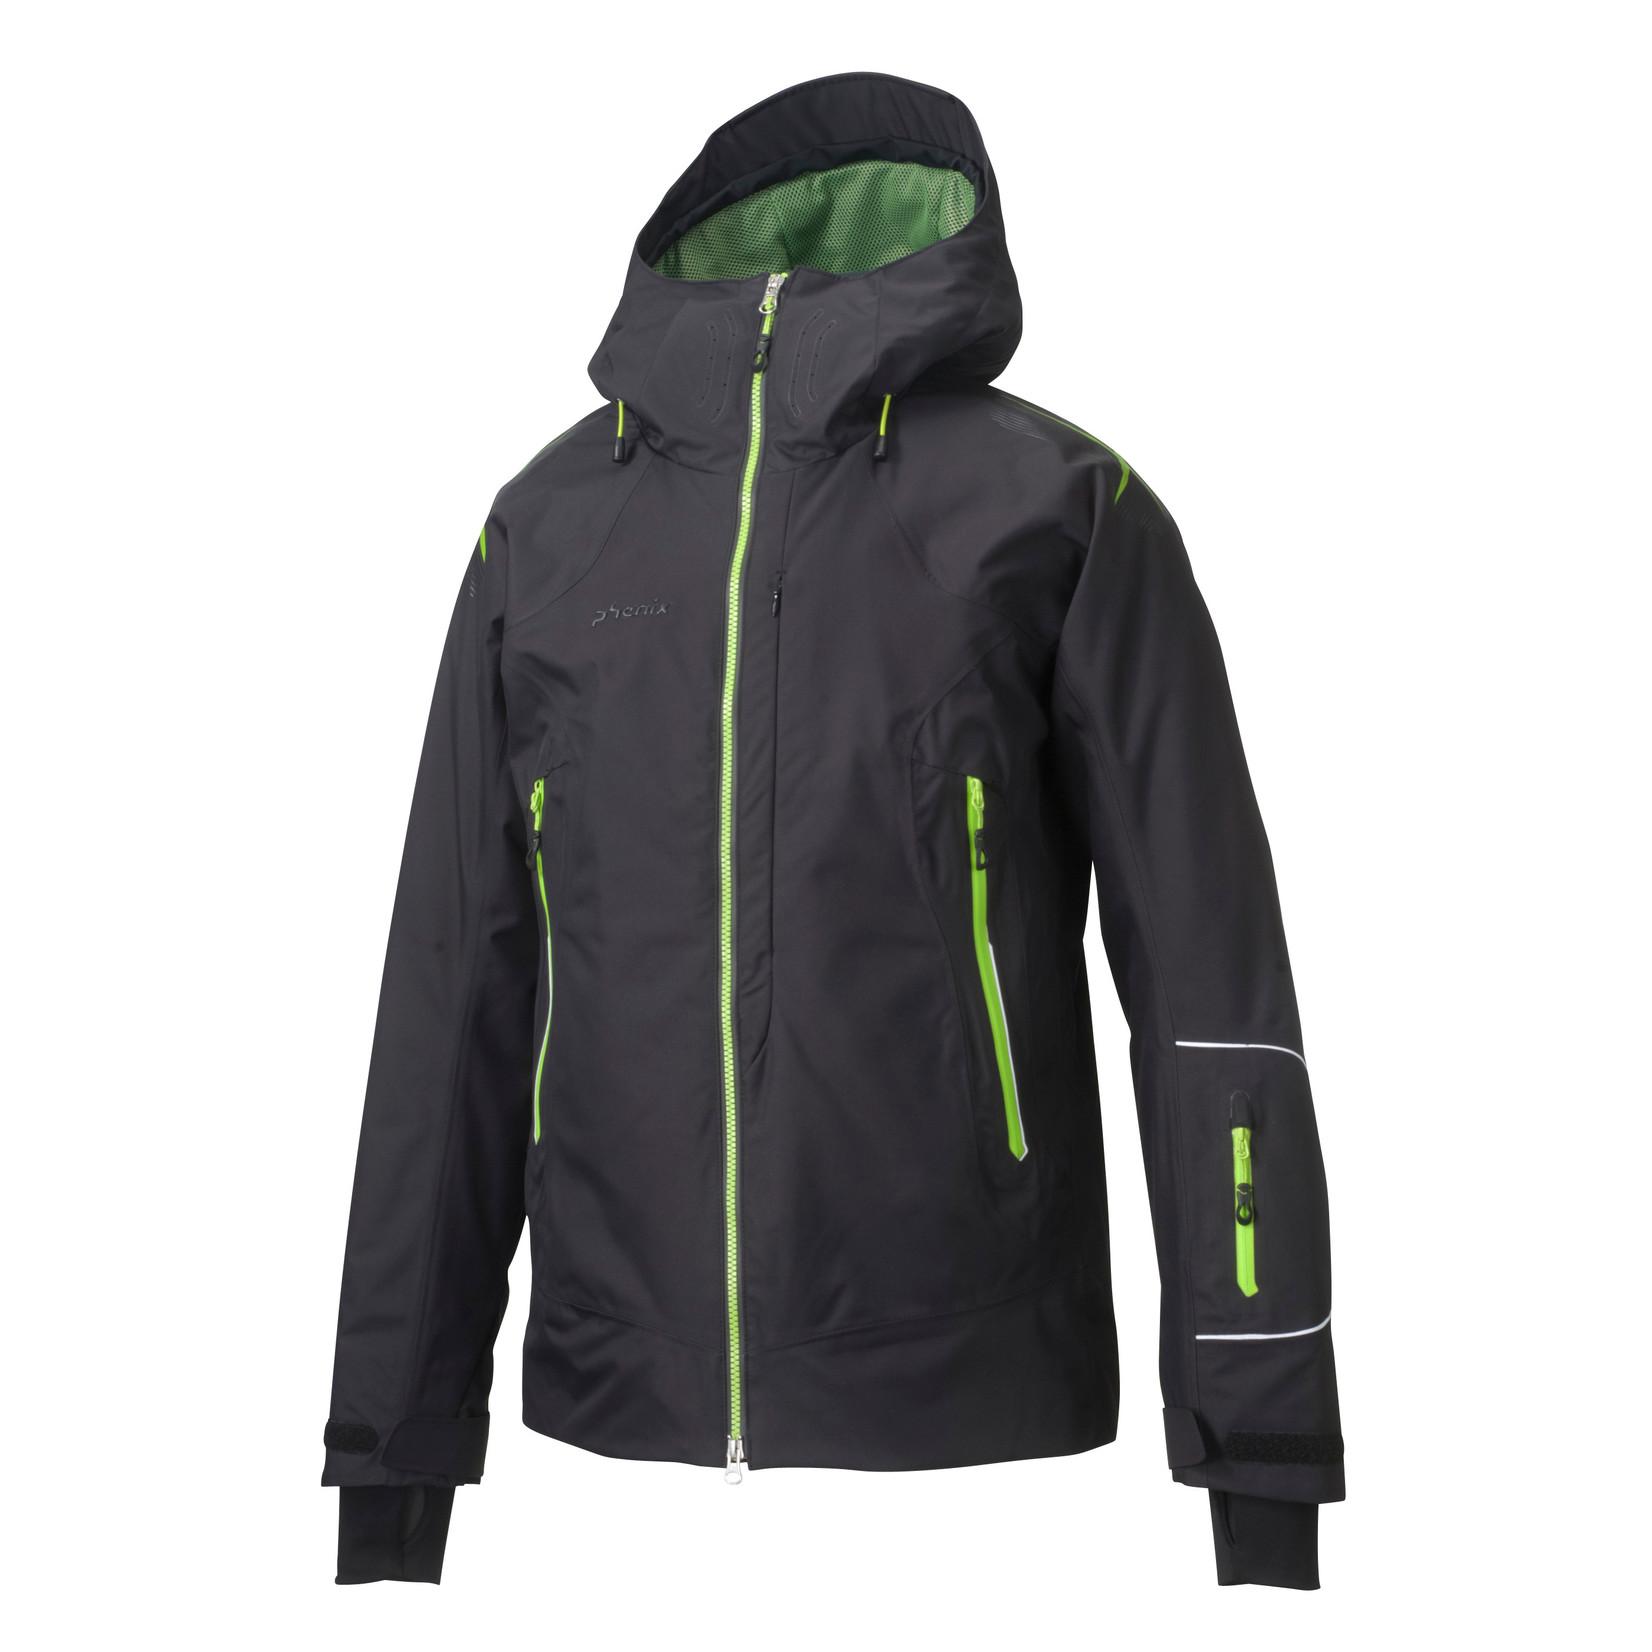 PHENIX Sogne 3in1 Jacket